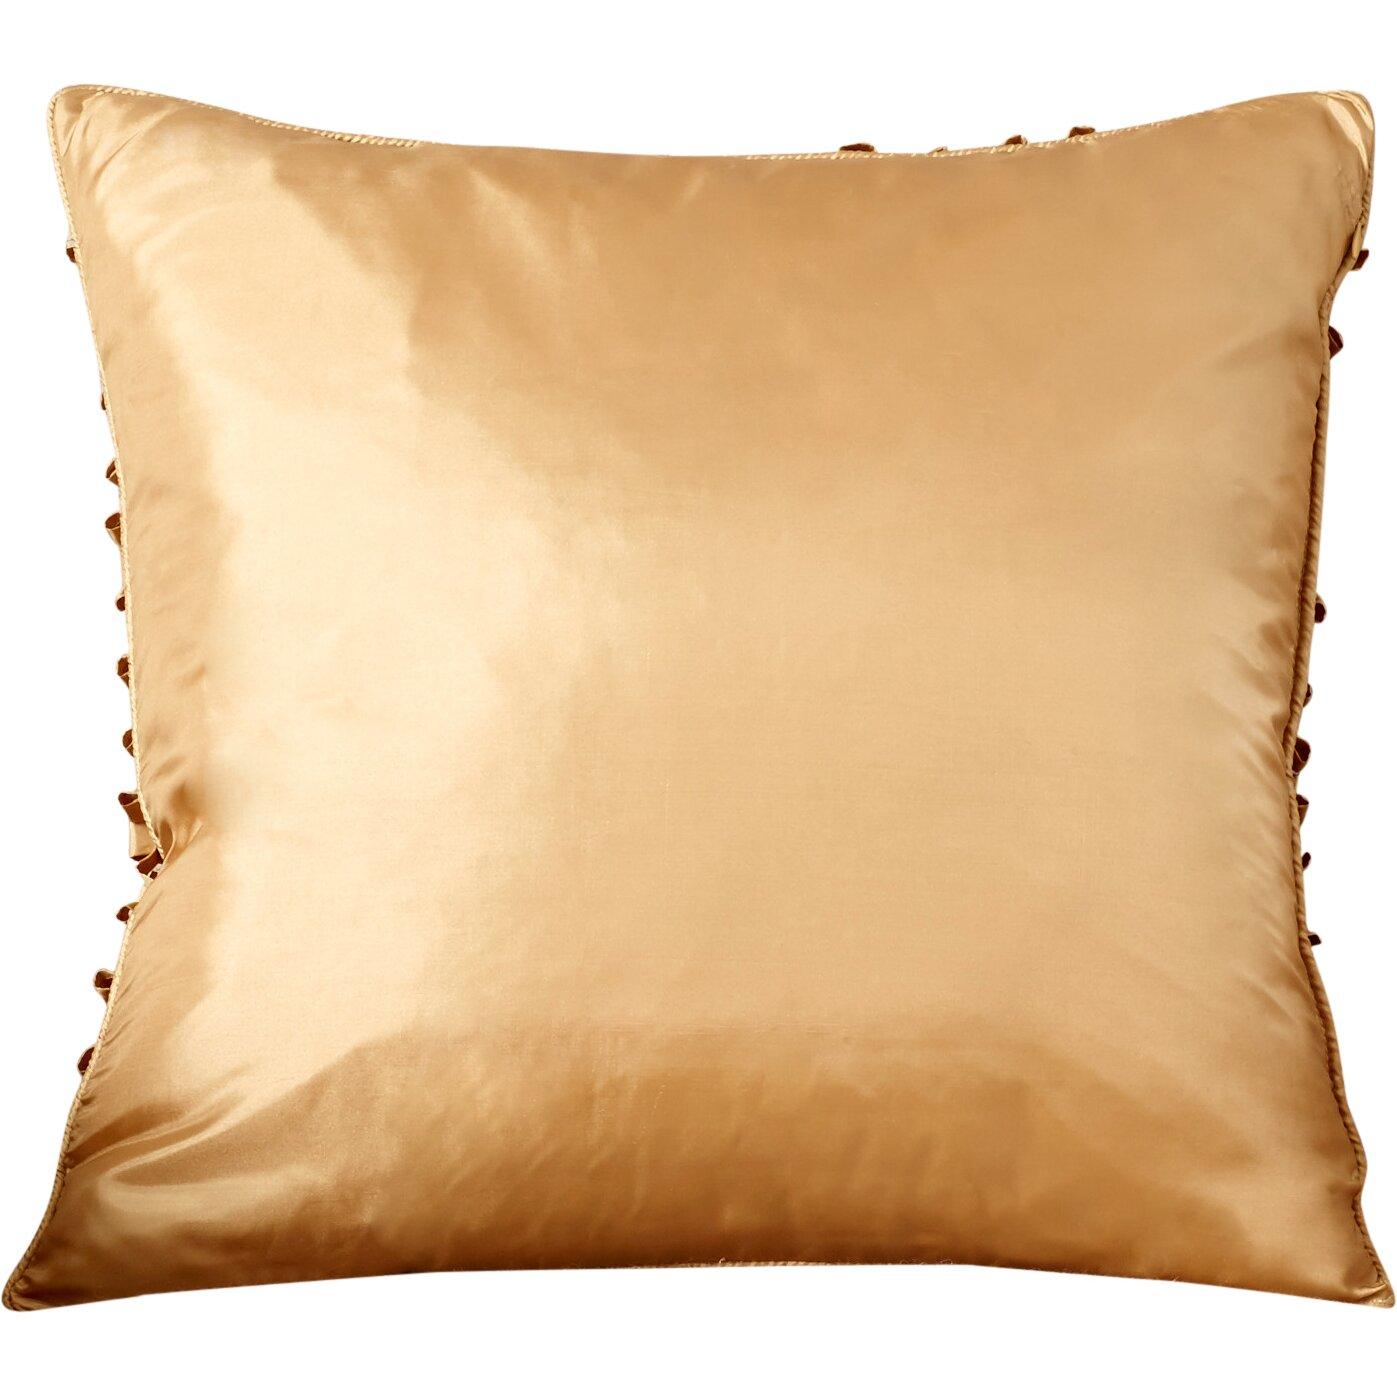 Viv + Rae Isabelle Synthetic Throw Pillow & Reviews Wayfair